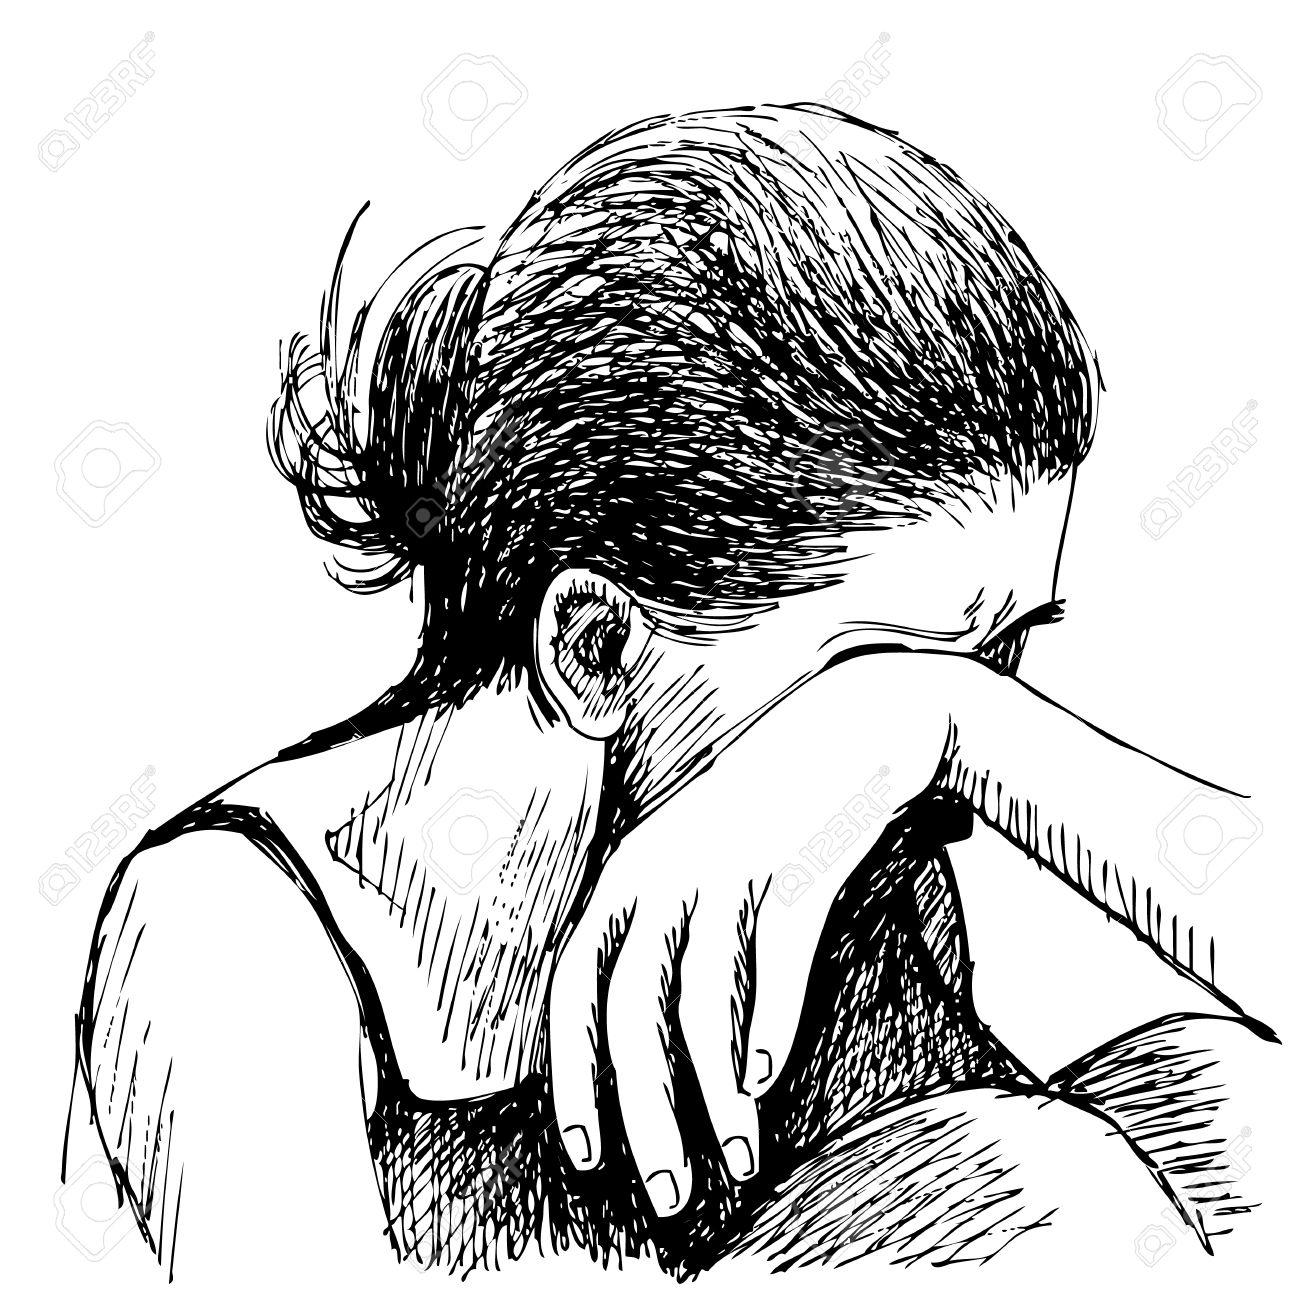 1300x1300 Human Emotion Sketch, Sad Girl Hand Drawn On White Background